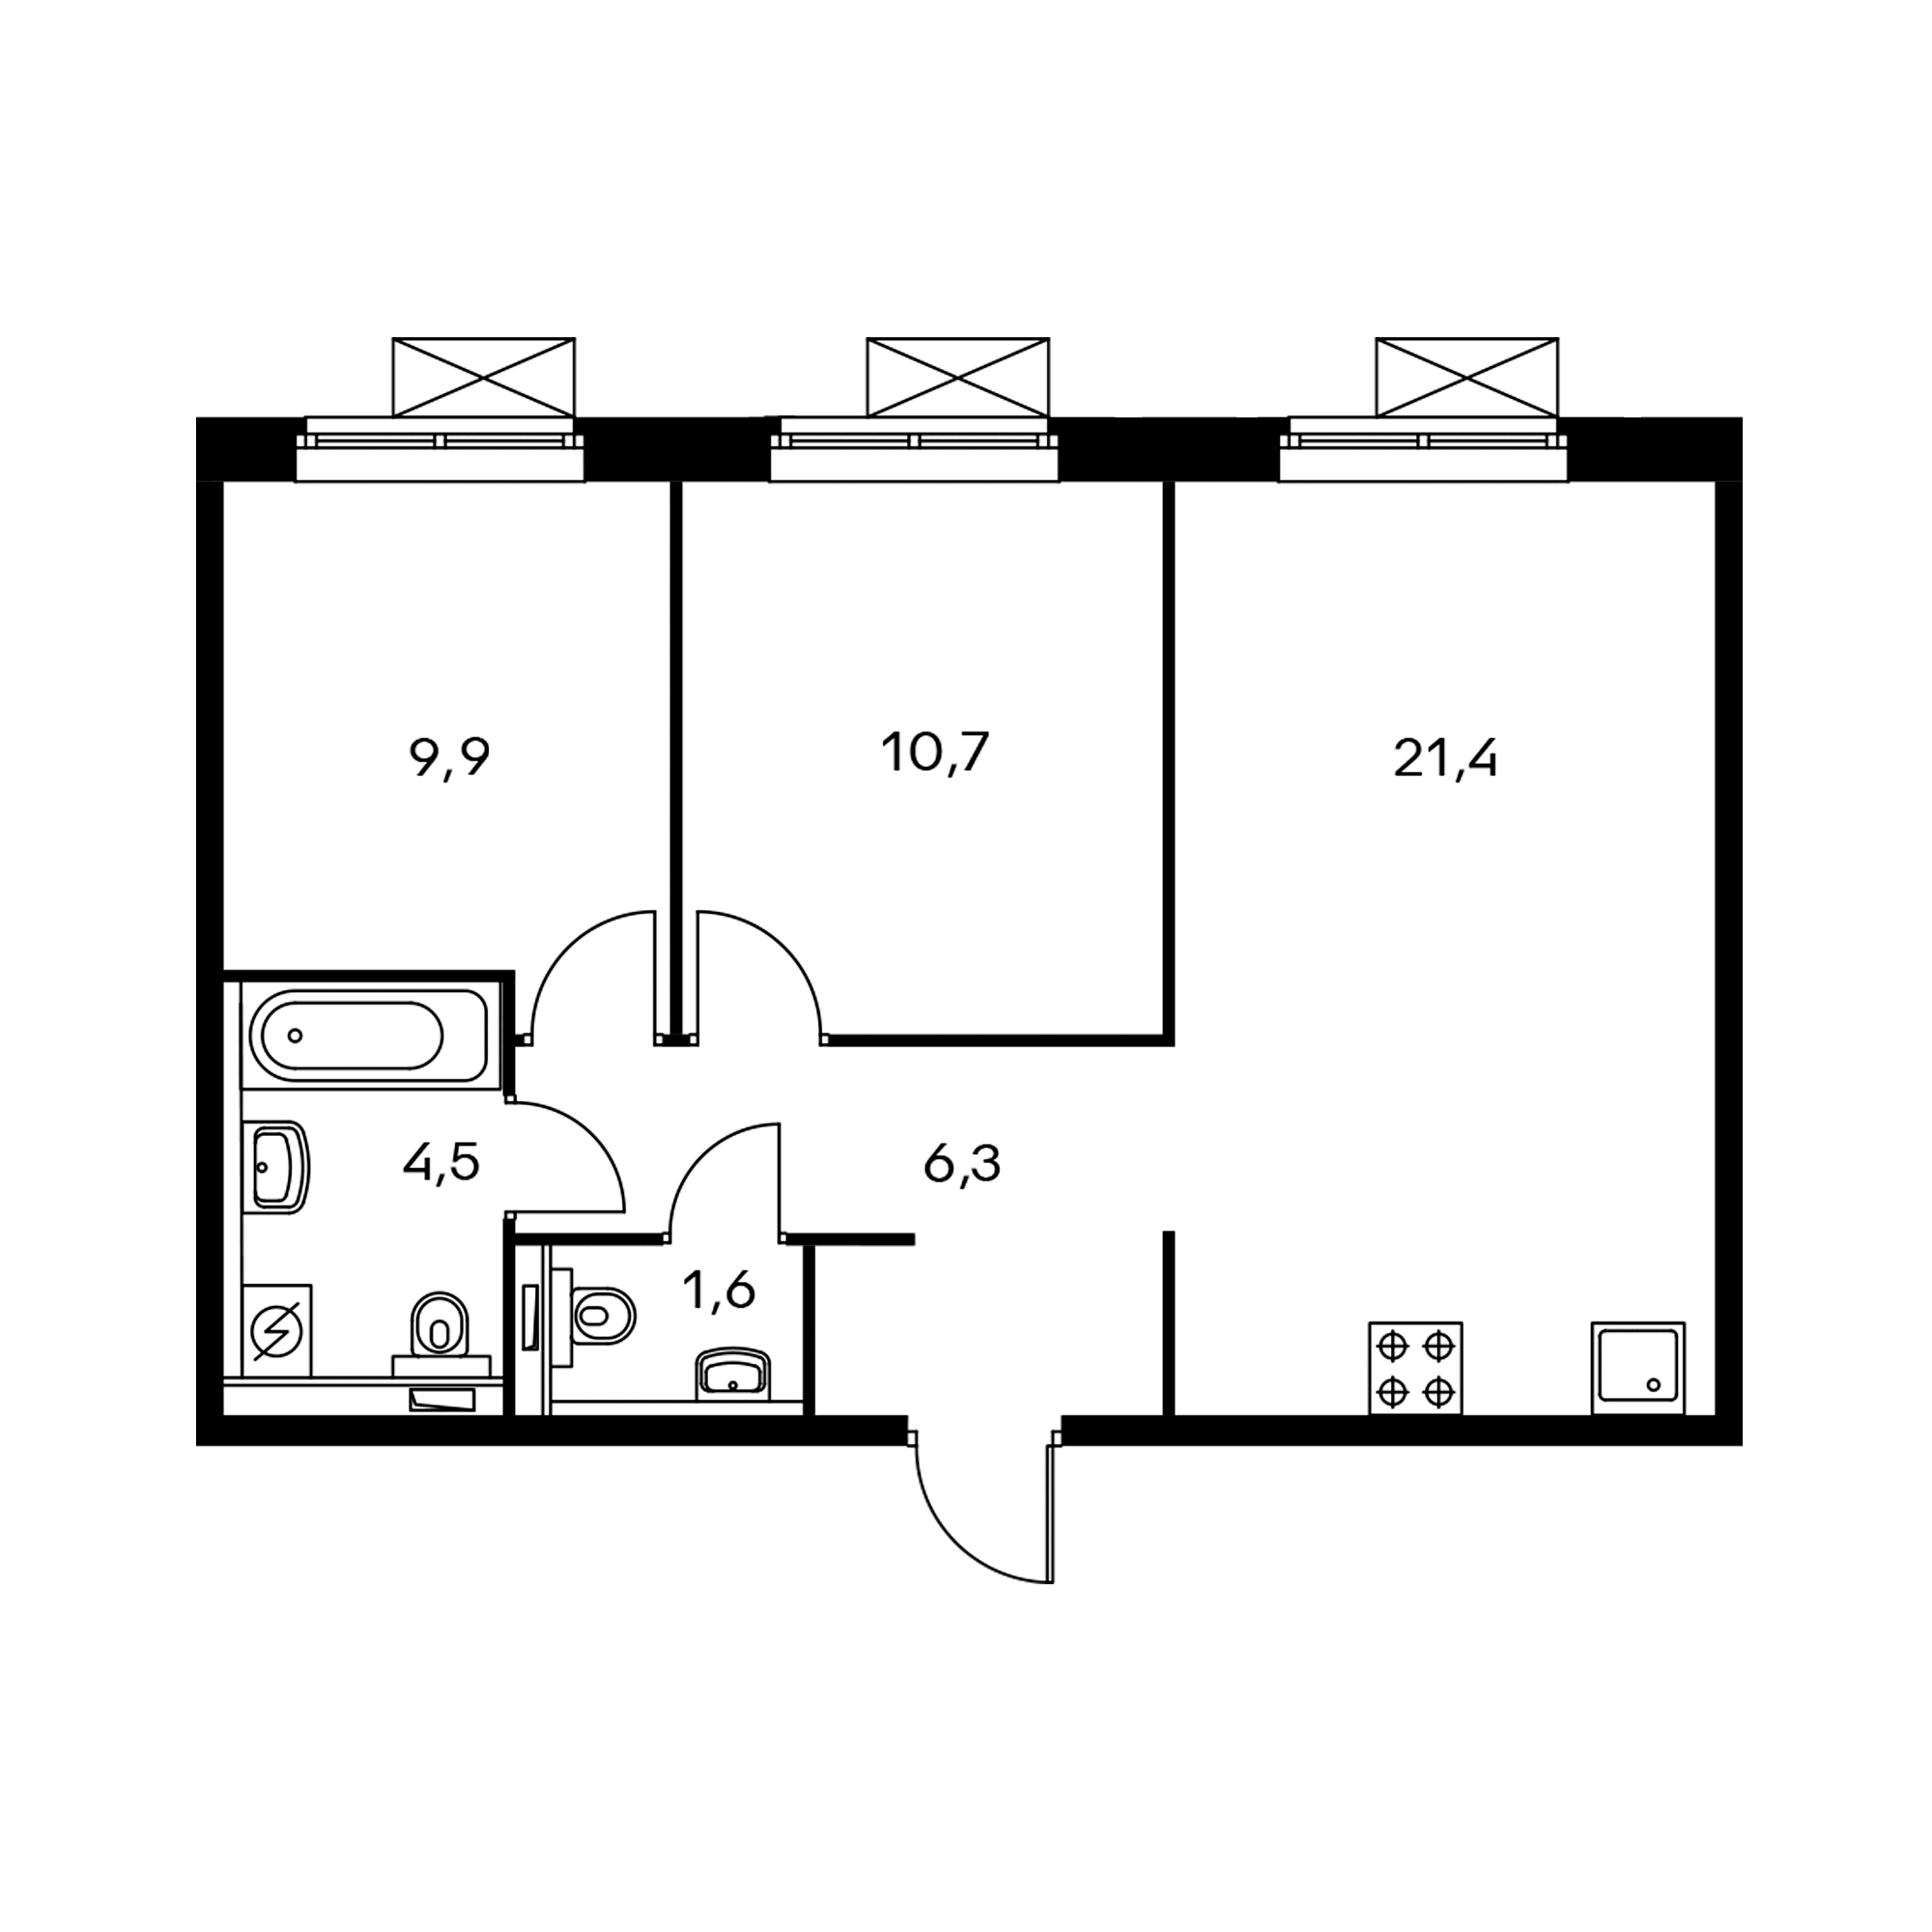 2ES9_9.6-1